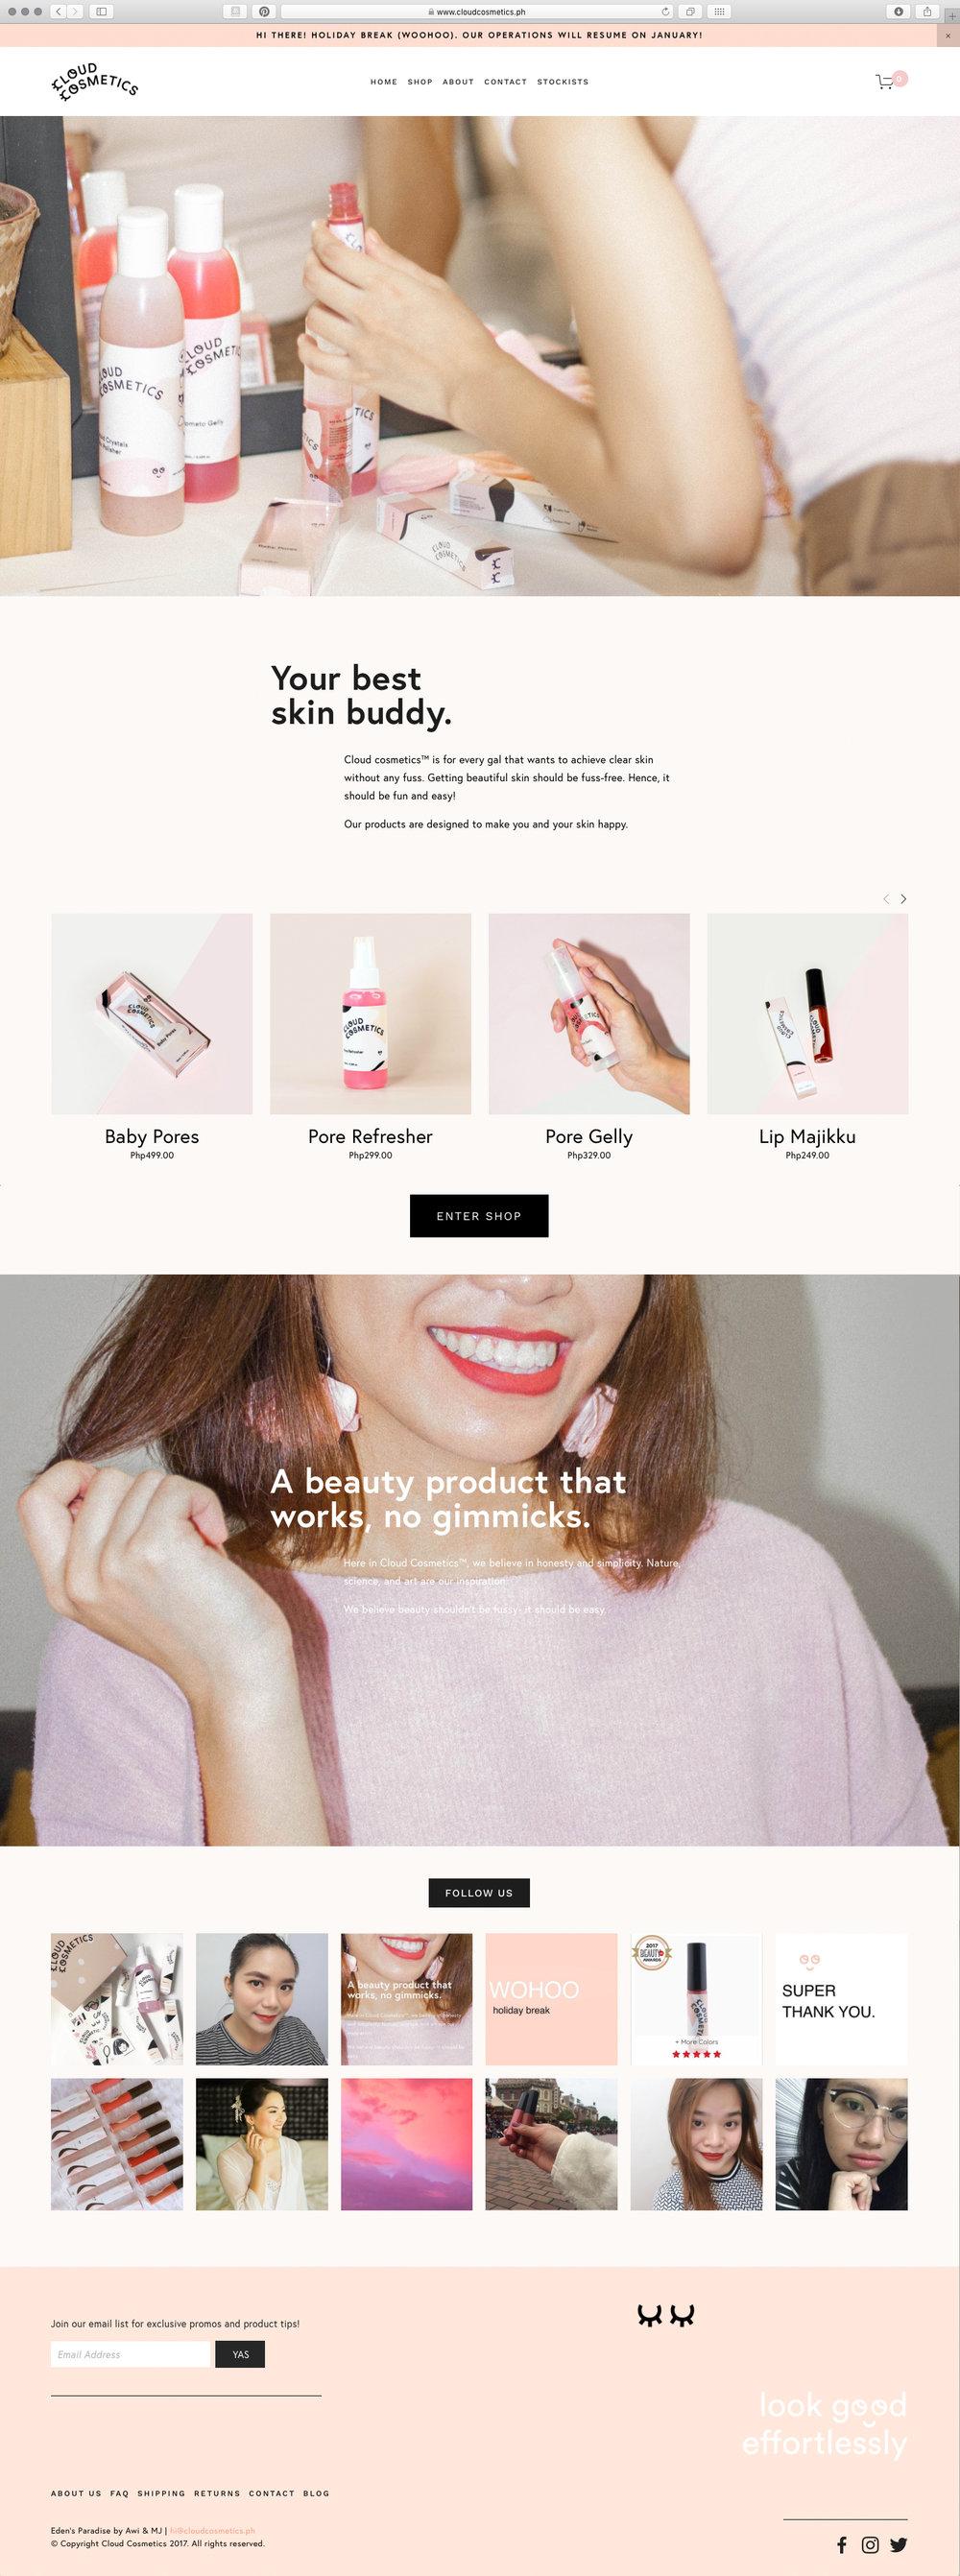 cc website.jpg